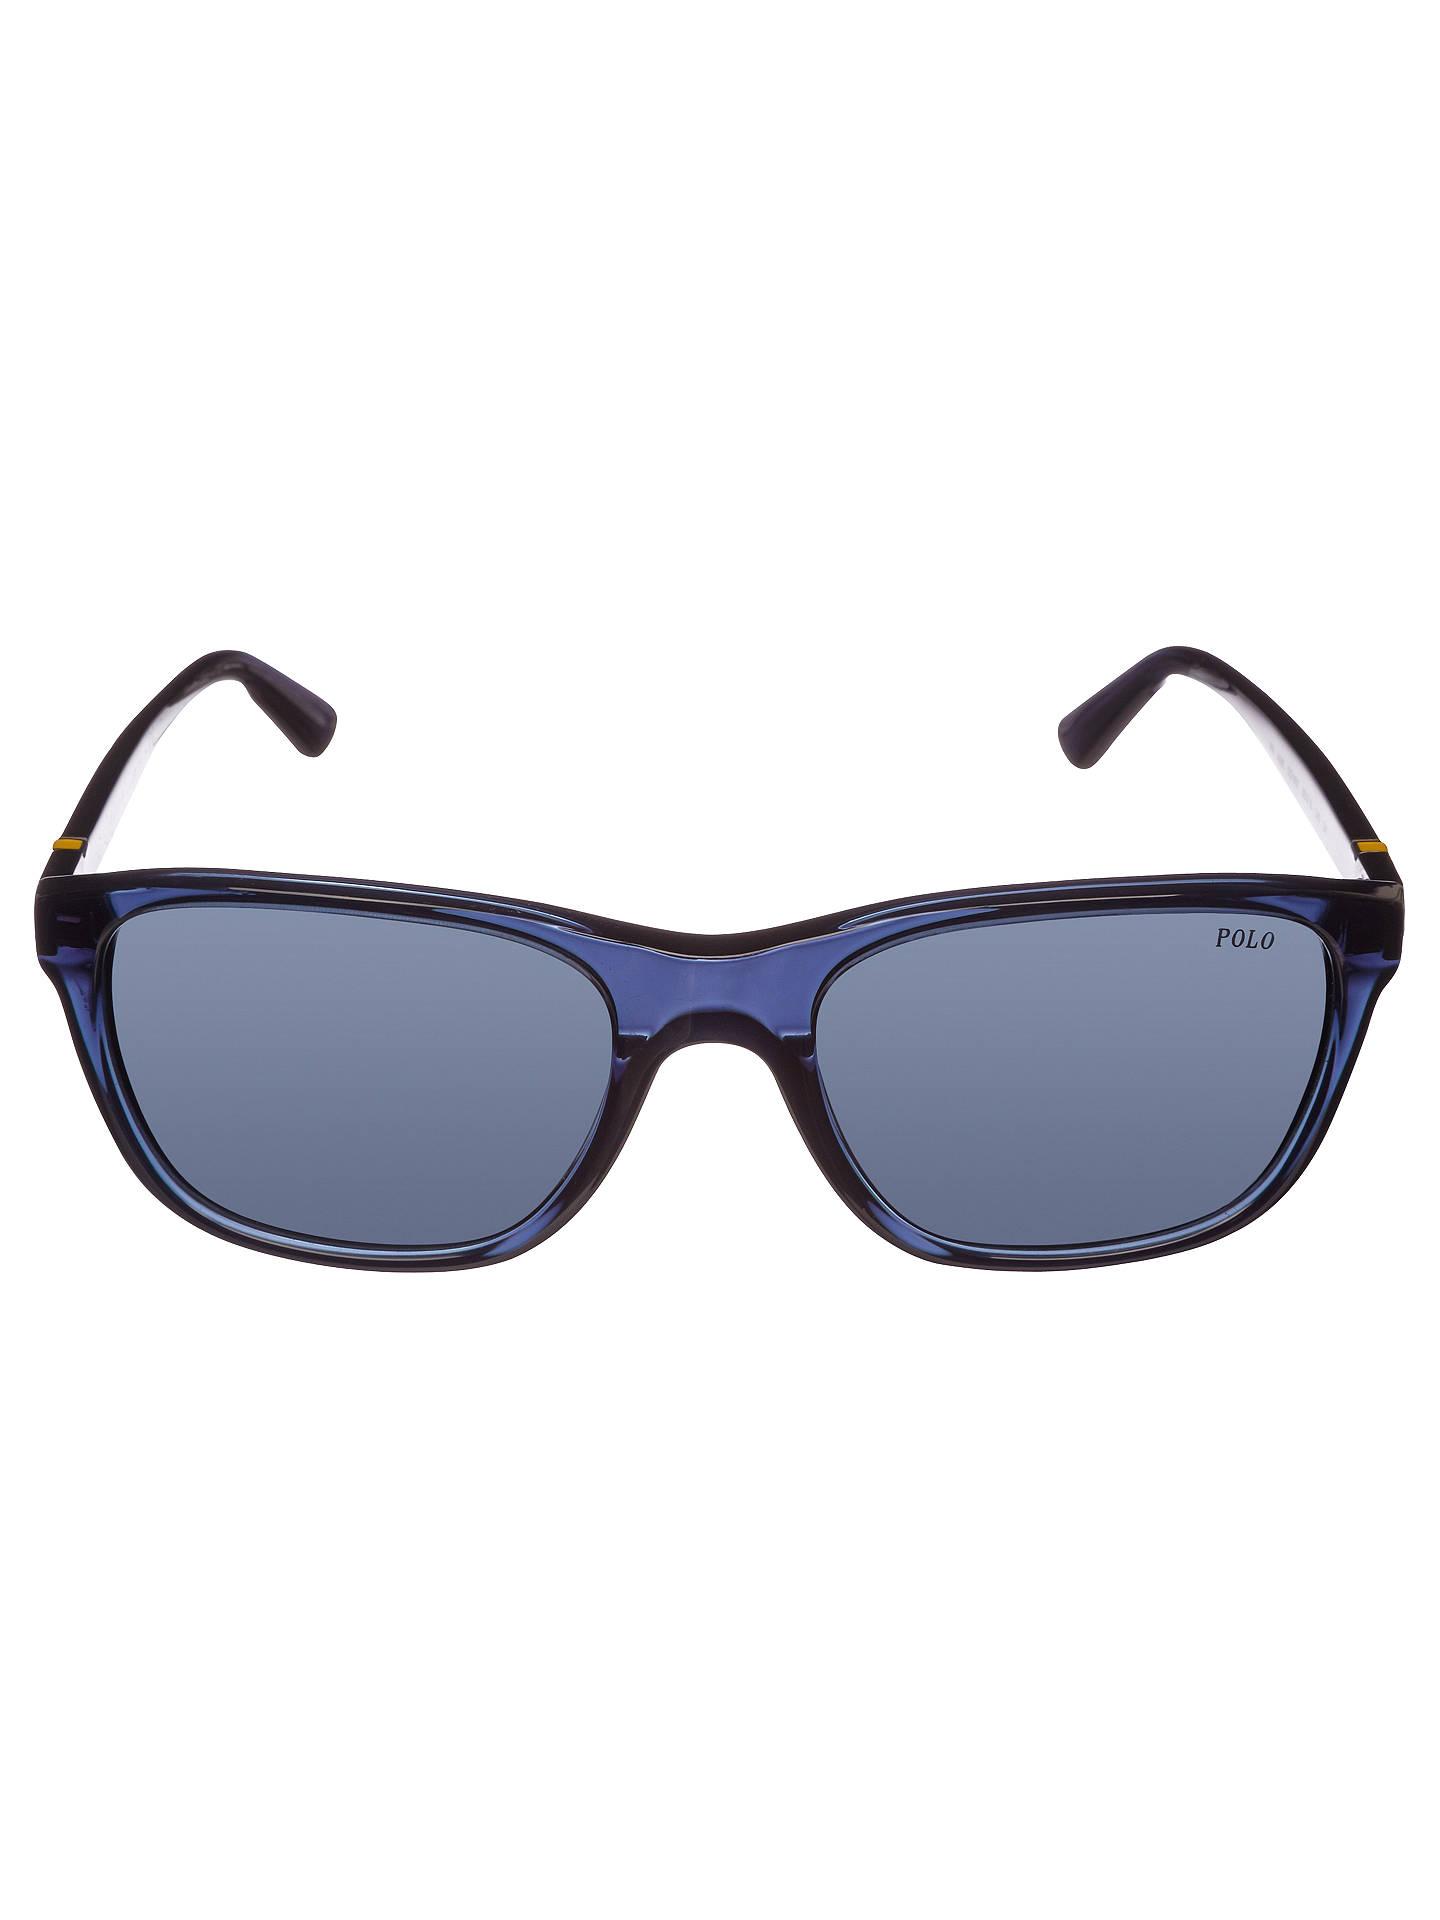 848f4258250e ... cheapest buypolo ralph lauren ph4085 527687 square sunglasses  transparent blue online at johnlewis e655b f9164